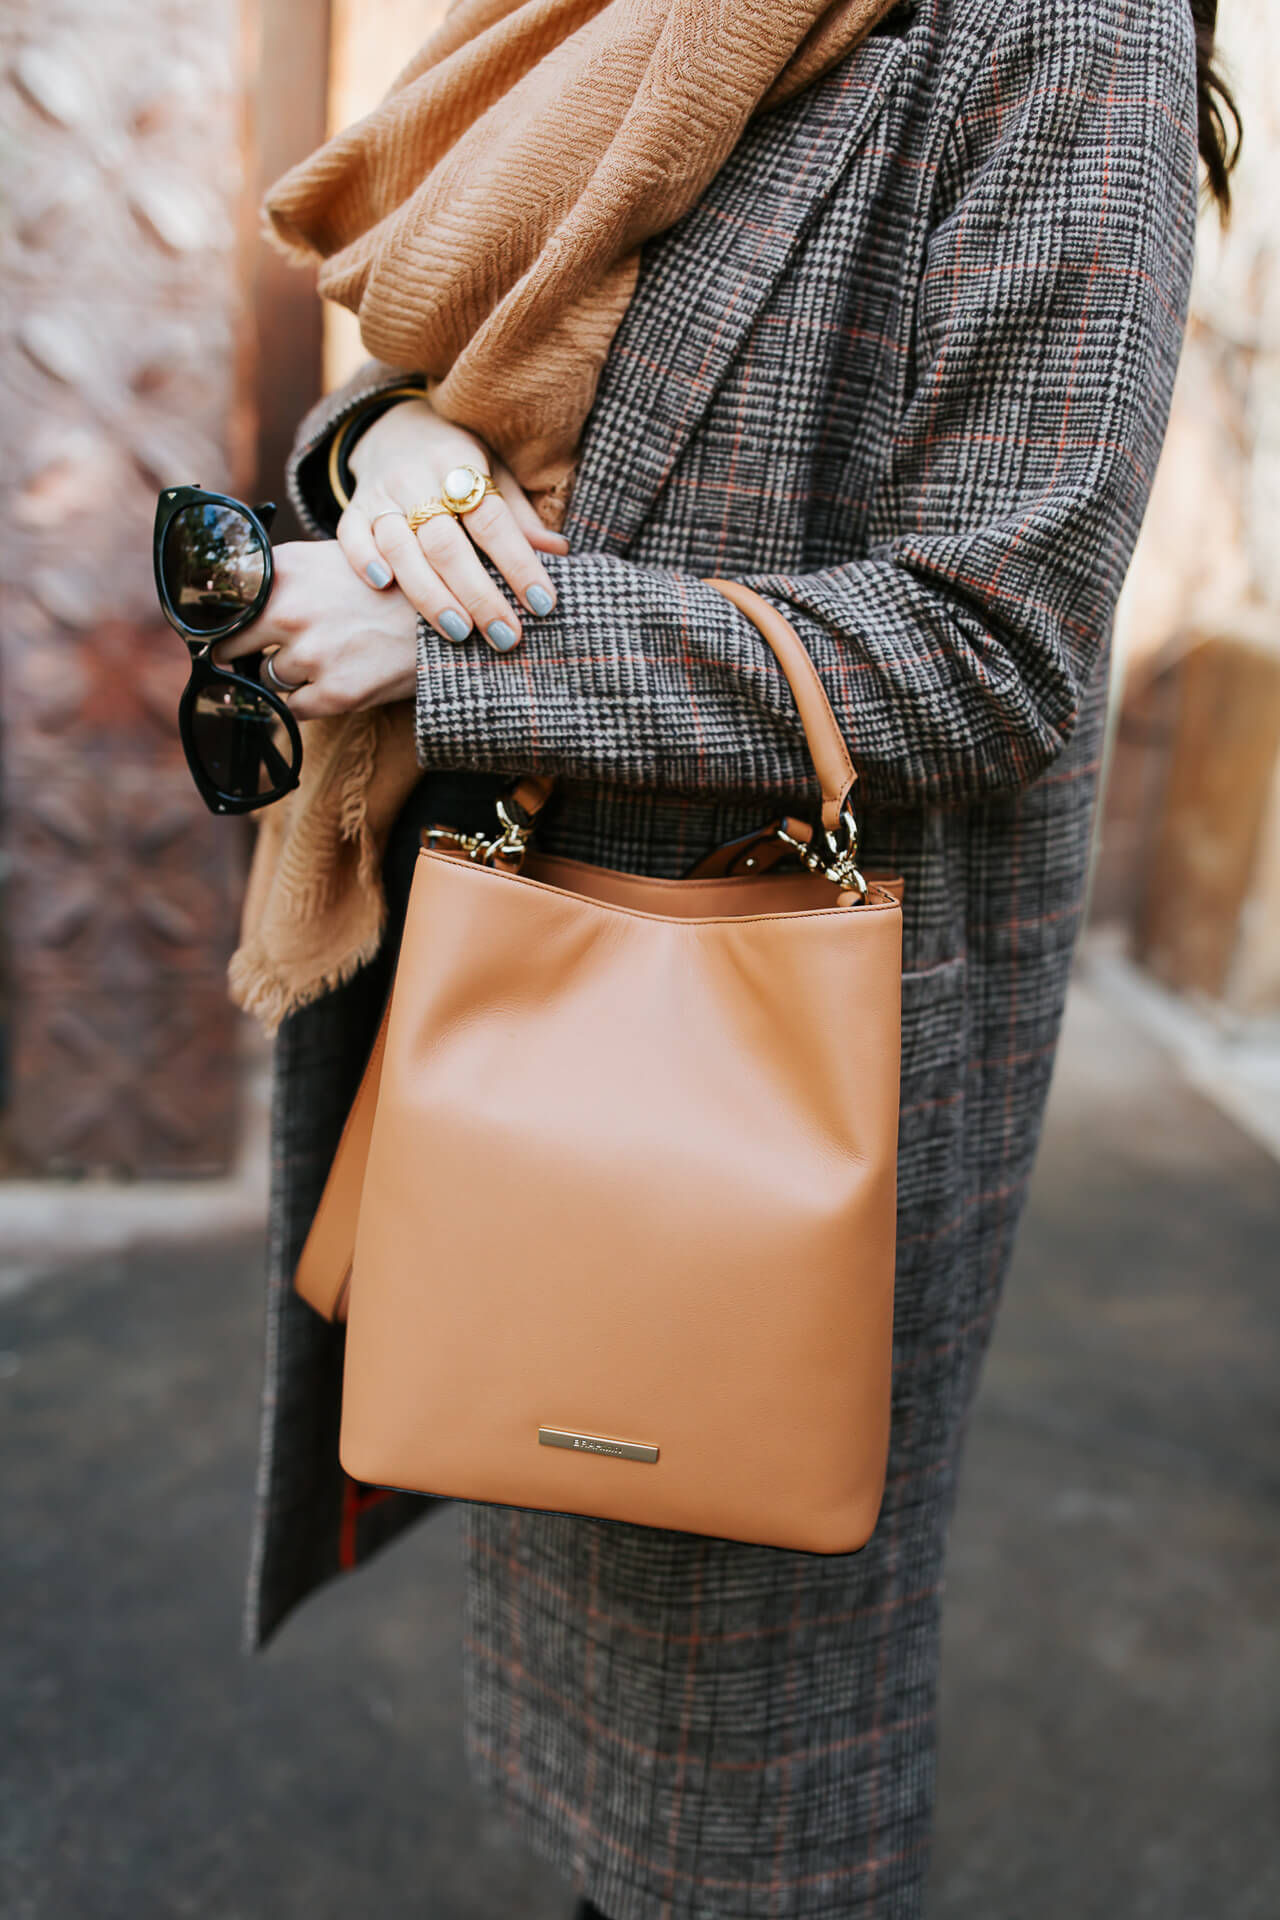 I love a classic brown leather handbag.